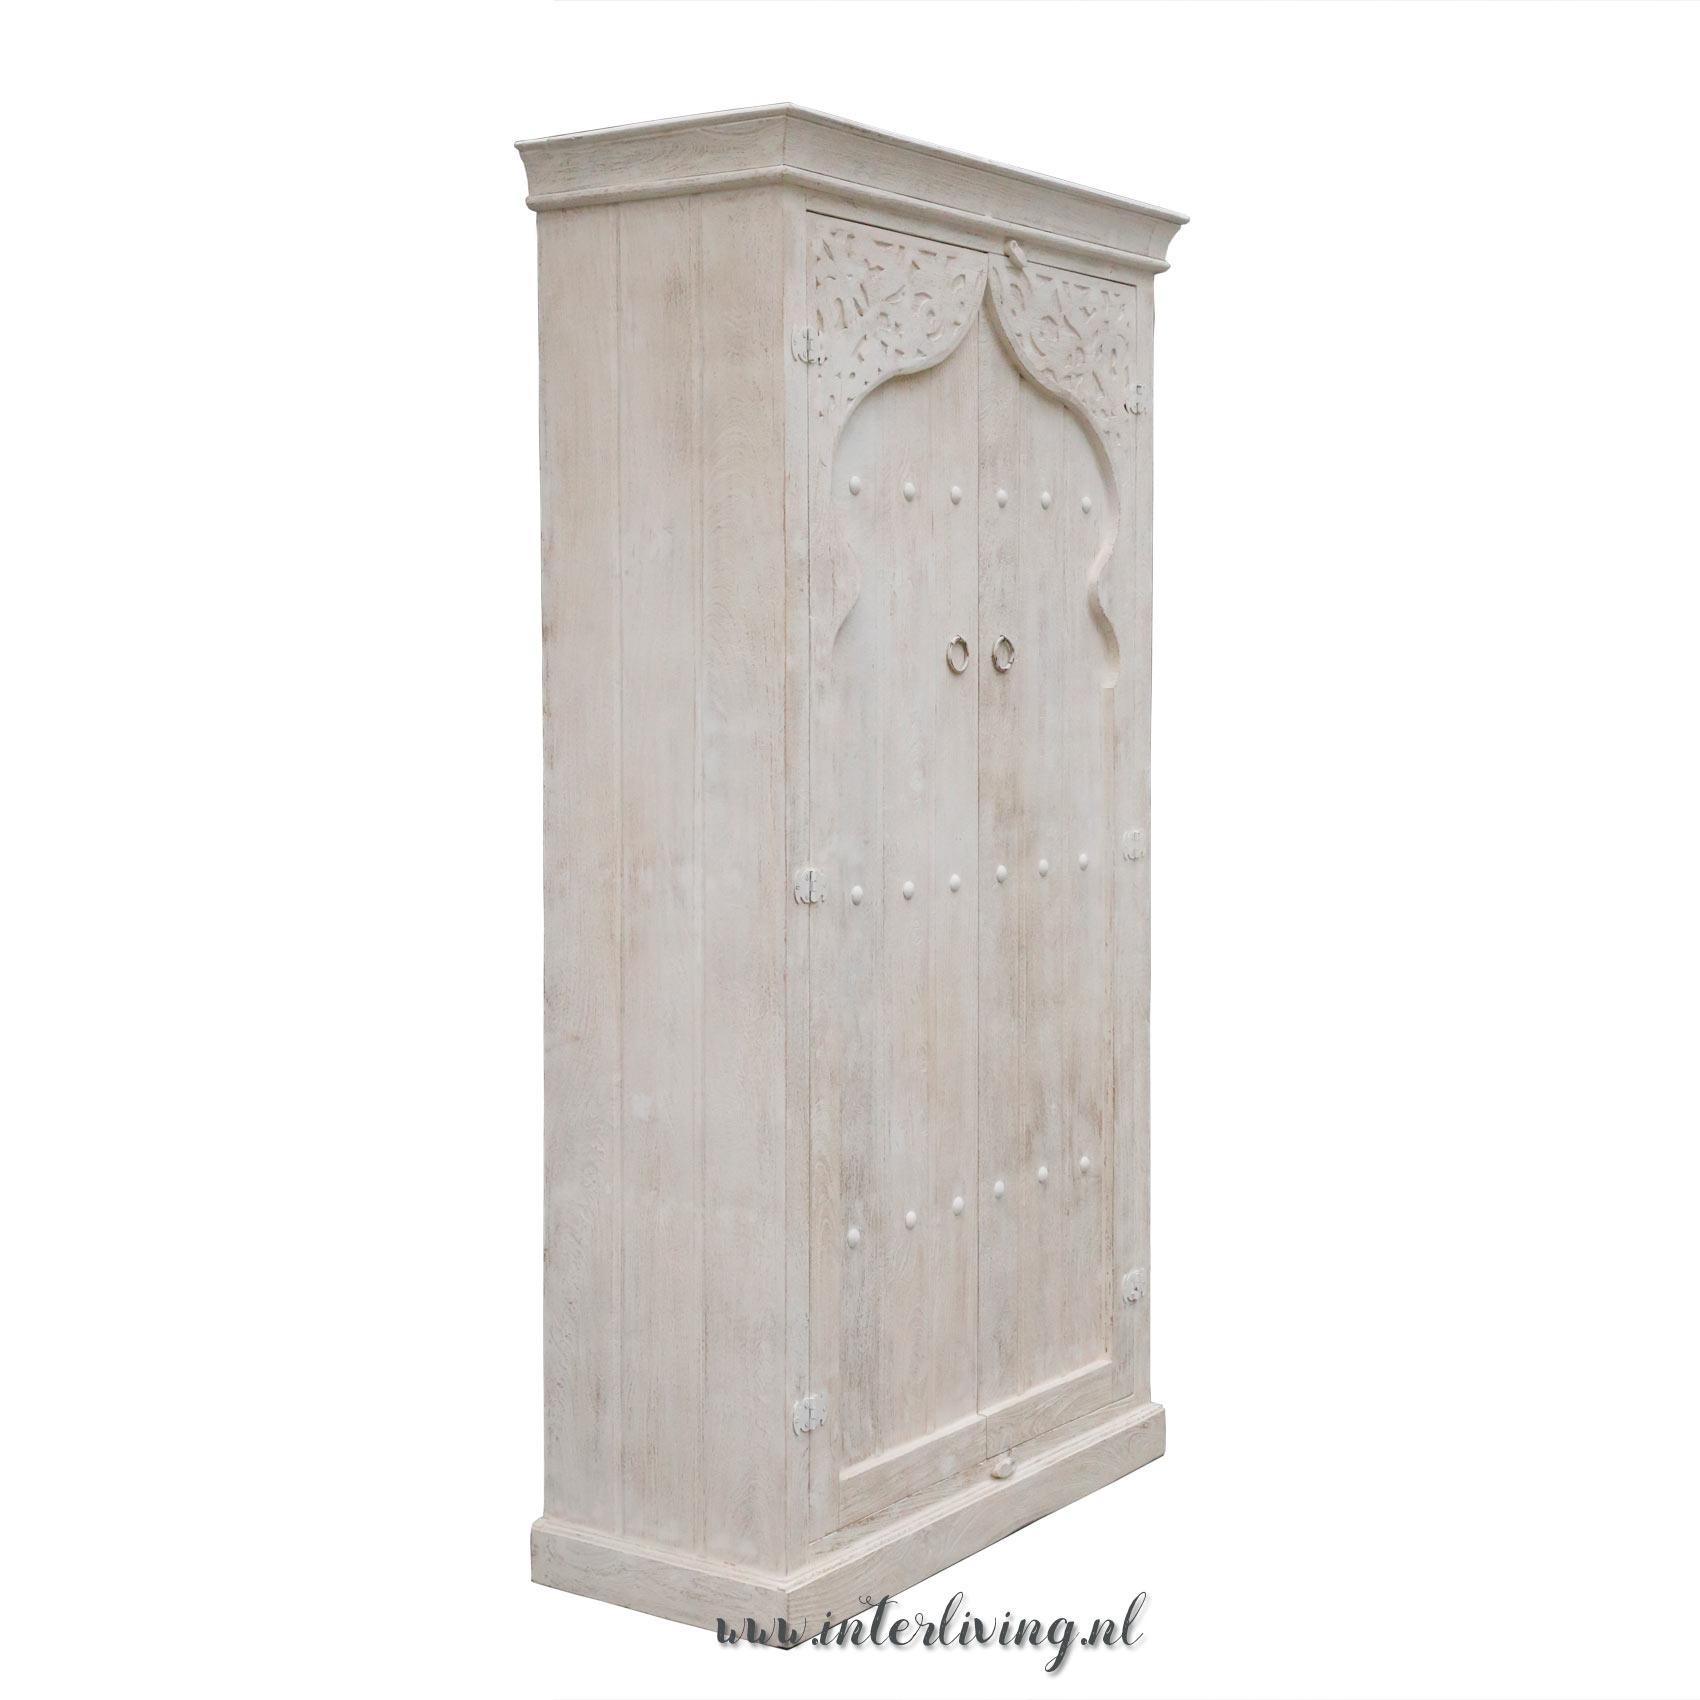 Grote Witte Houten Kast.Marokkaanse Stijl Kast Wit Van Hout Met Bogen Oude Deur Uit Marrakesh